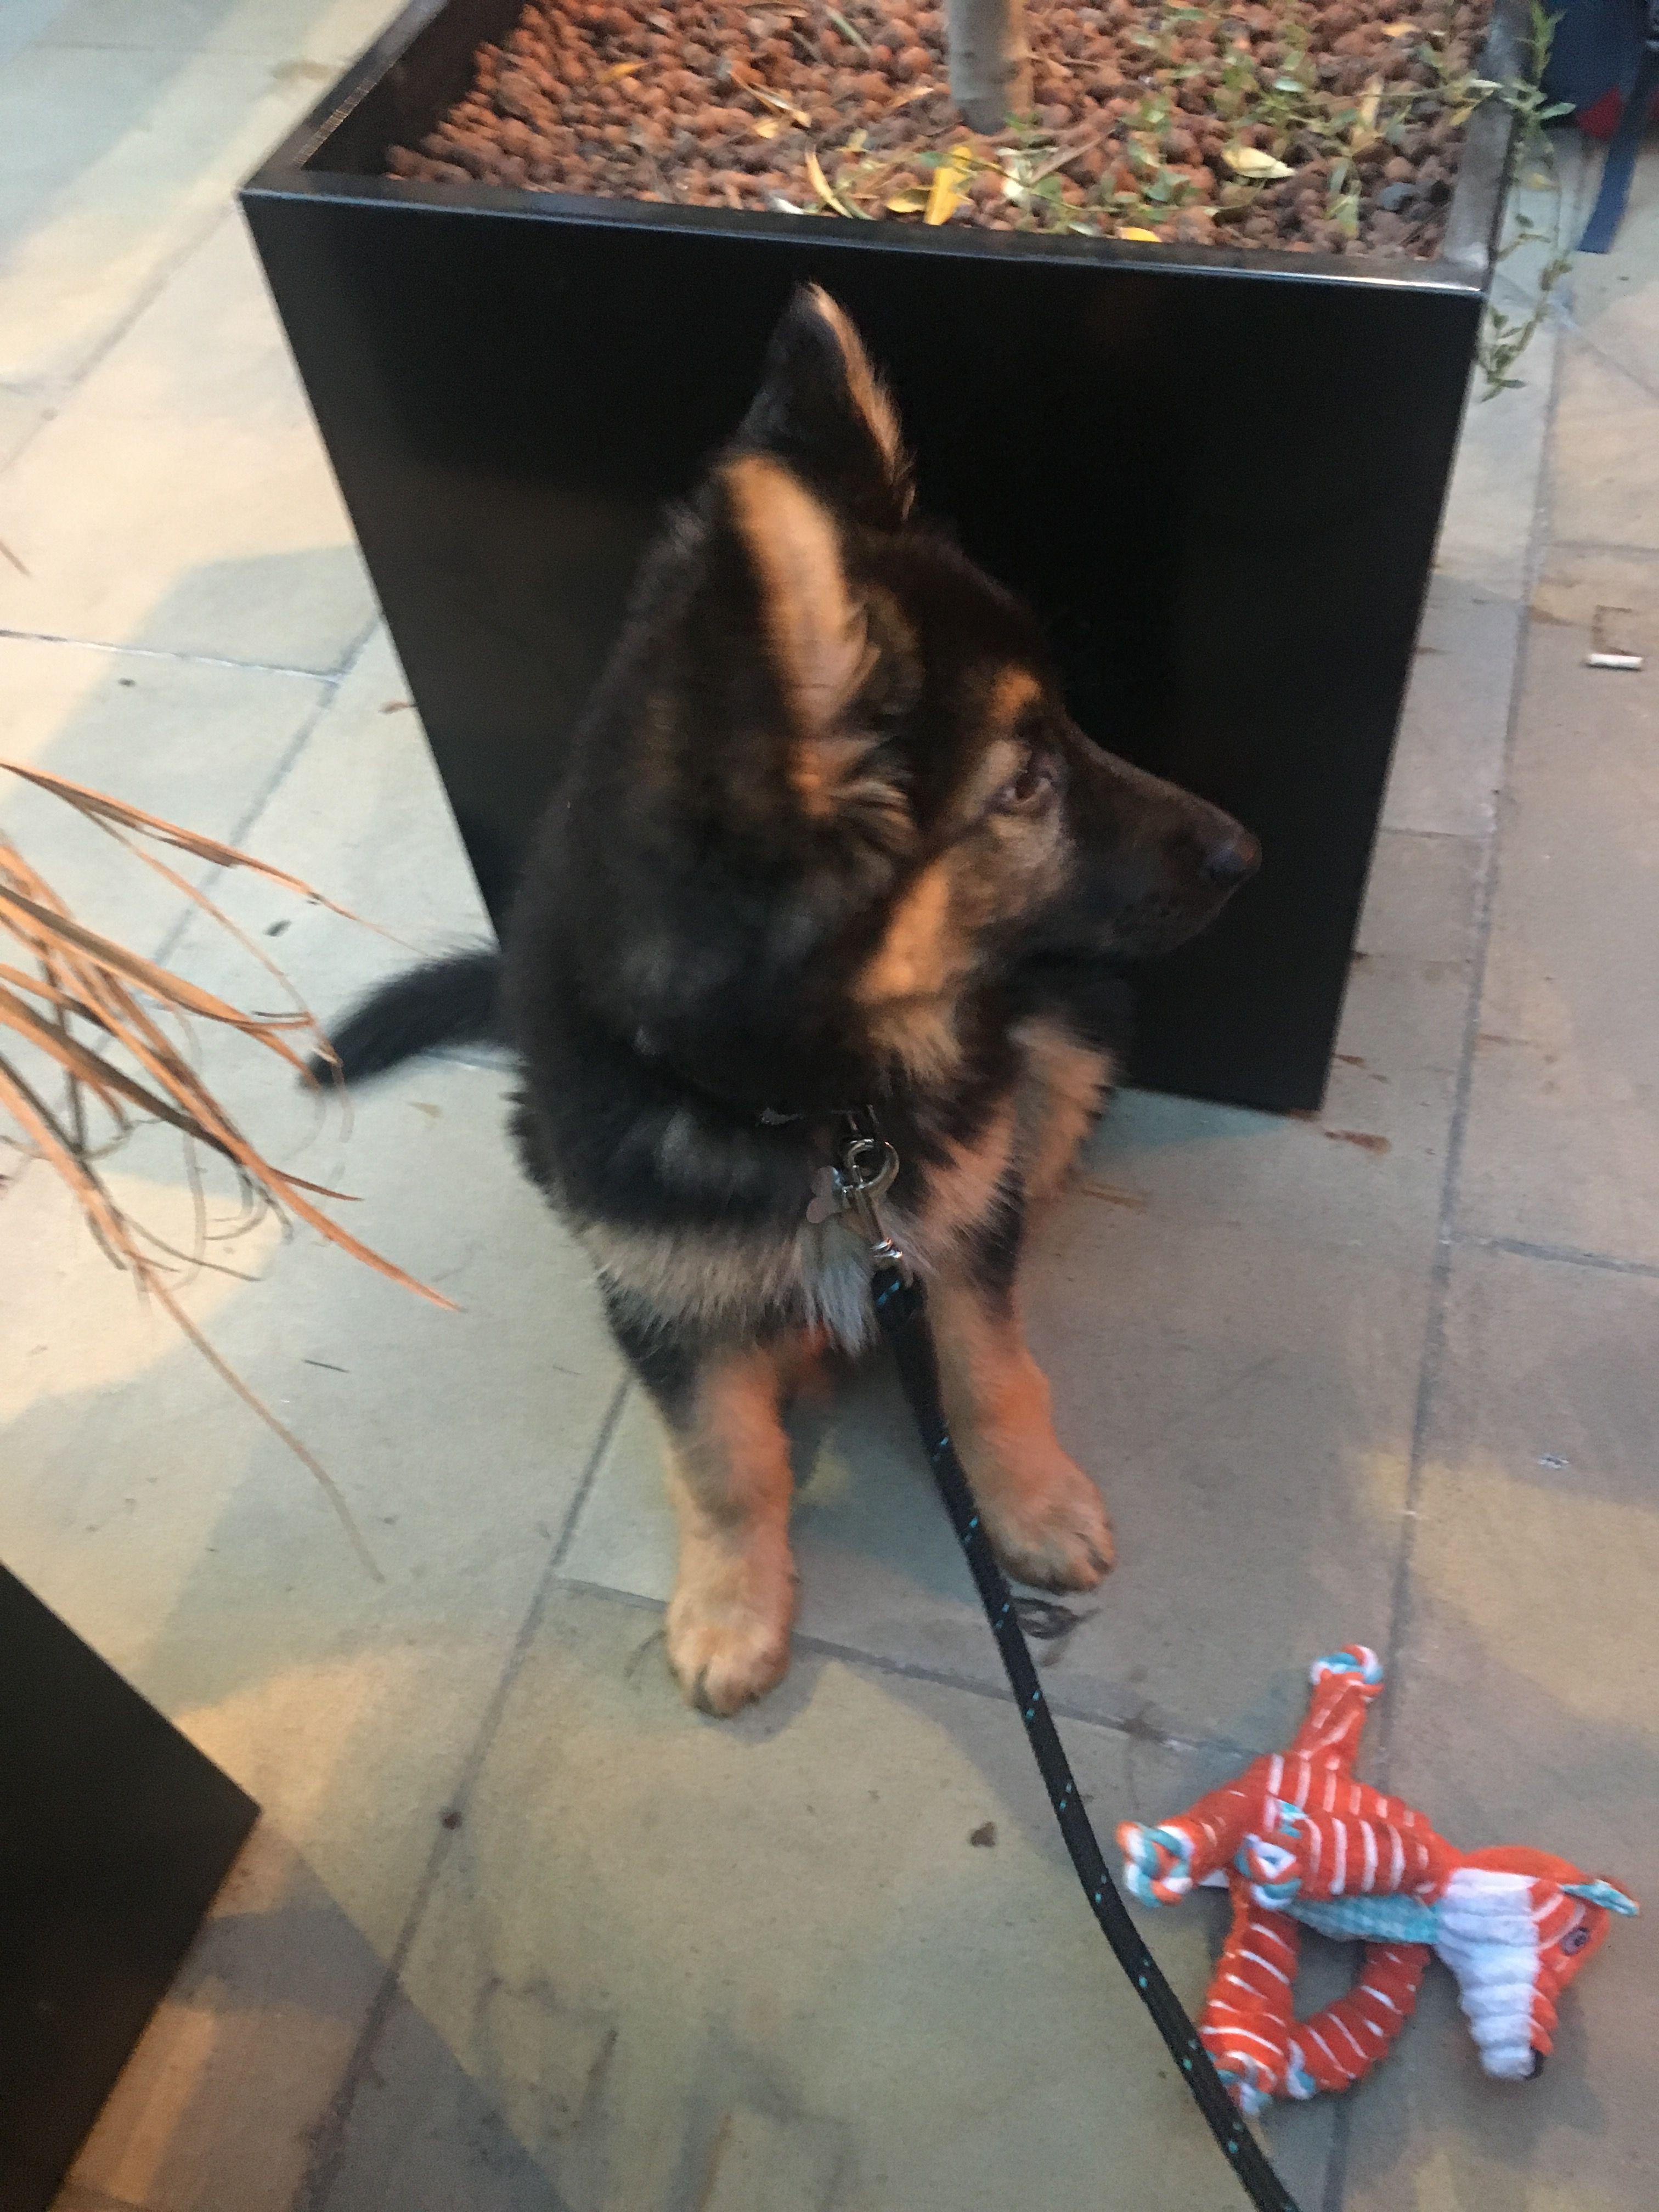 10 Week Old German Shepherd Puppy Happily Sitting While Mummy Eats